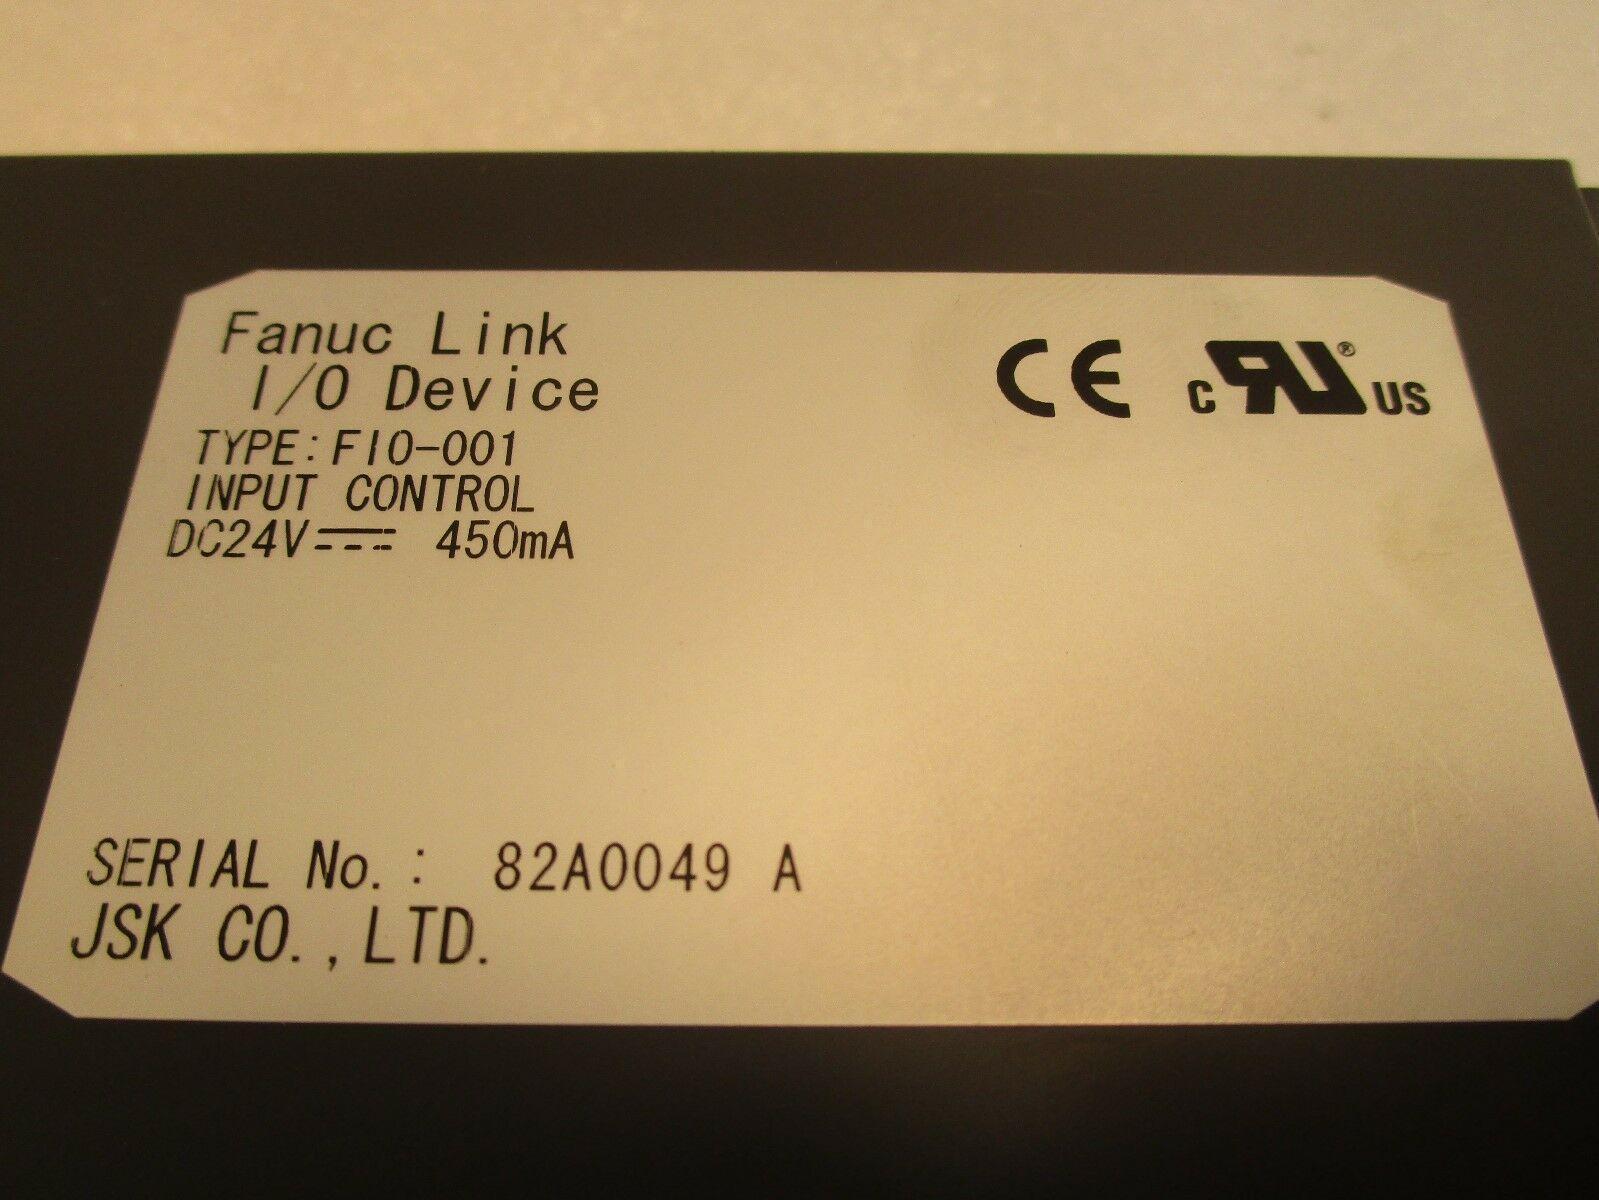 JSK Co Japan Control Engineering JCE F10-001 I/O Device